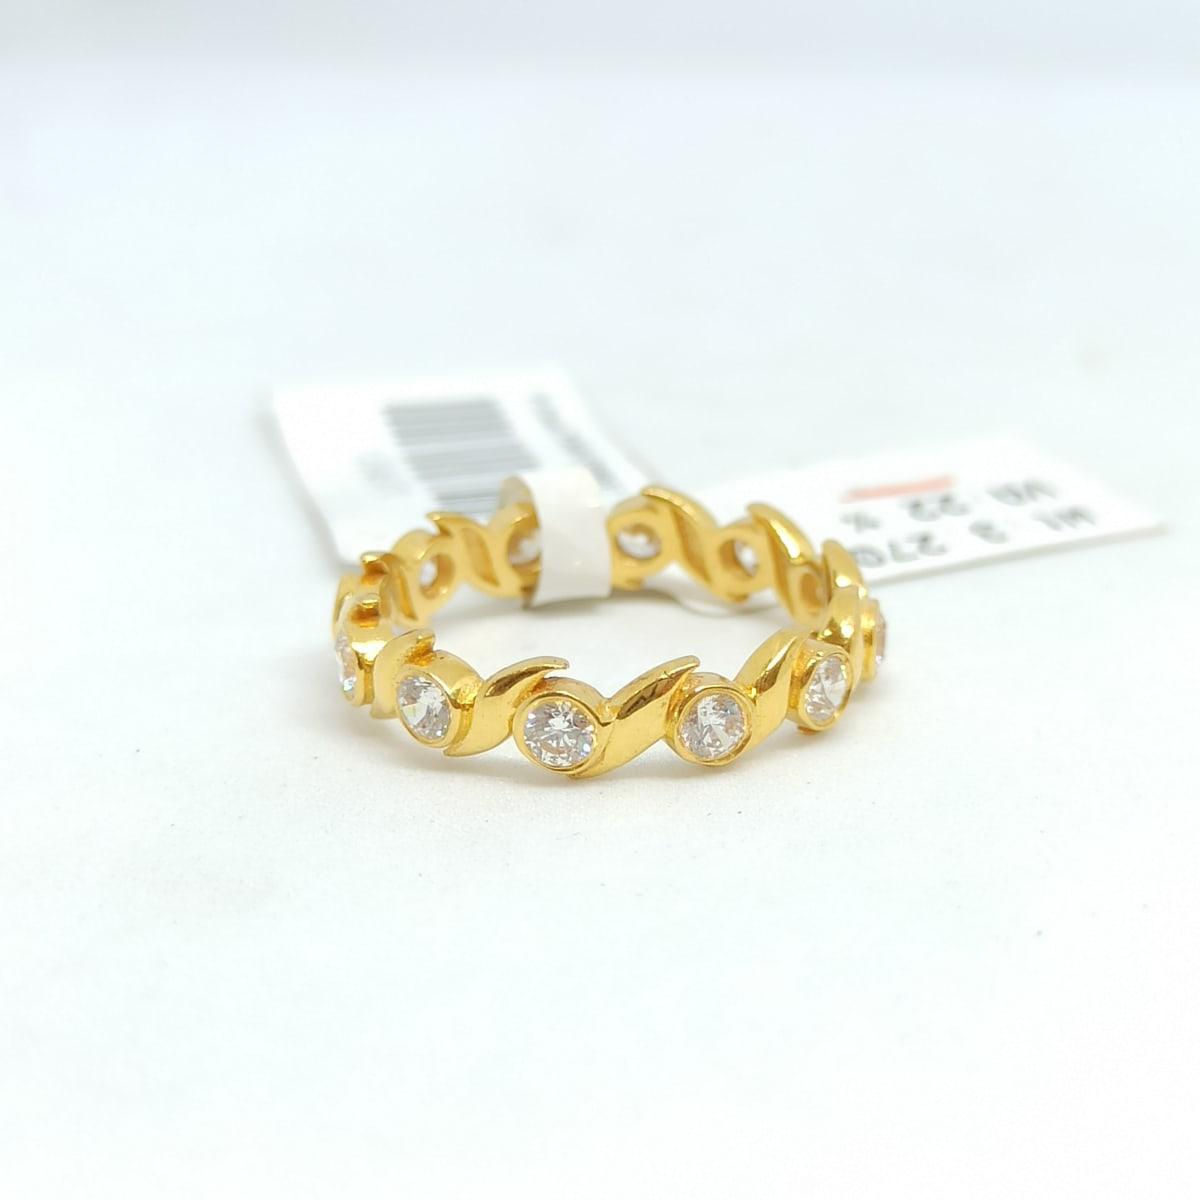 Waves Cz Band Ring